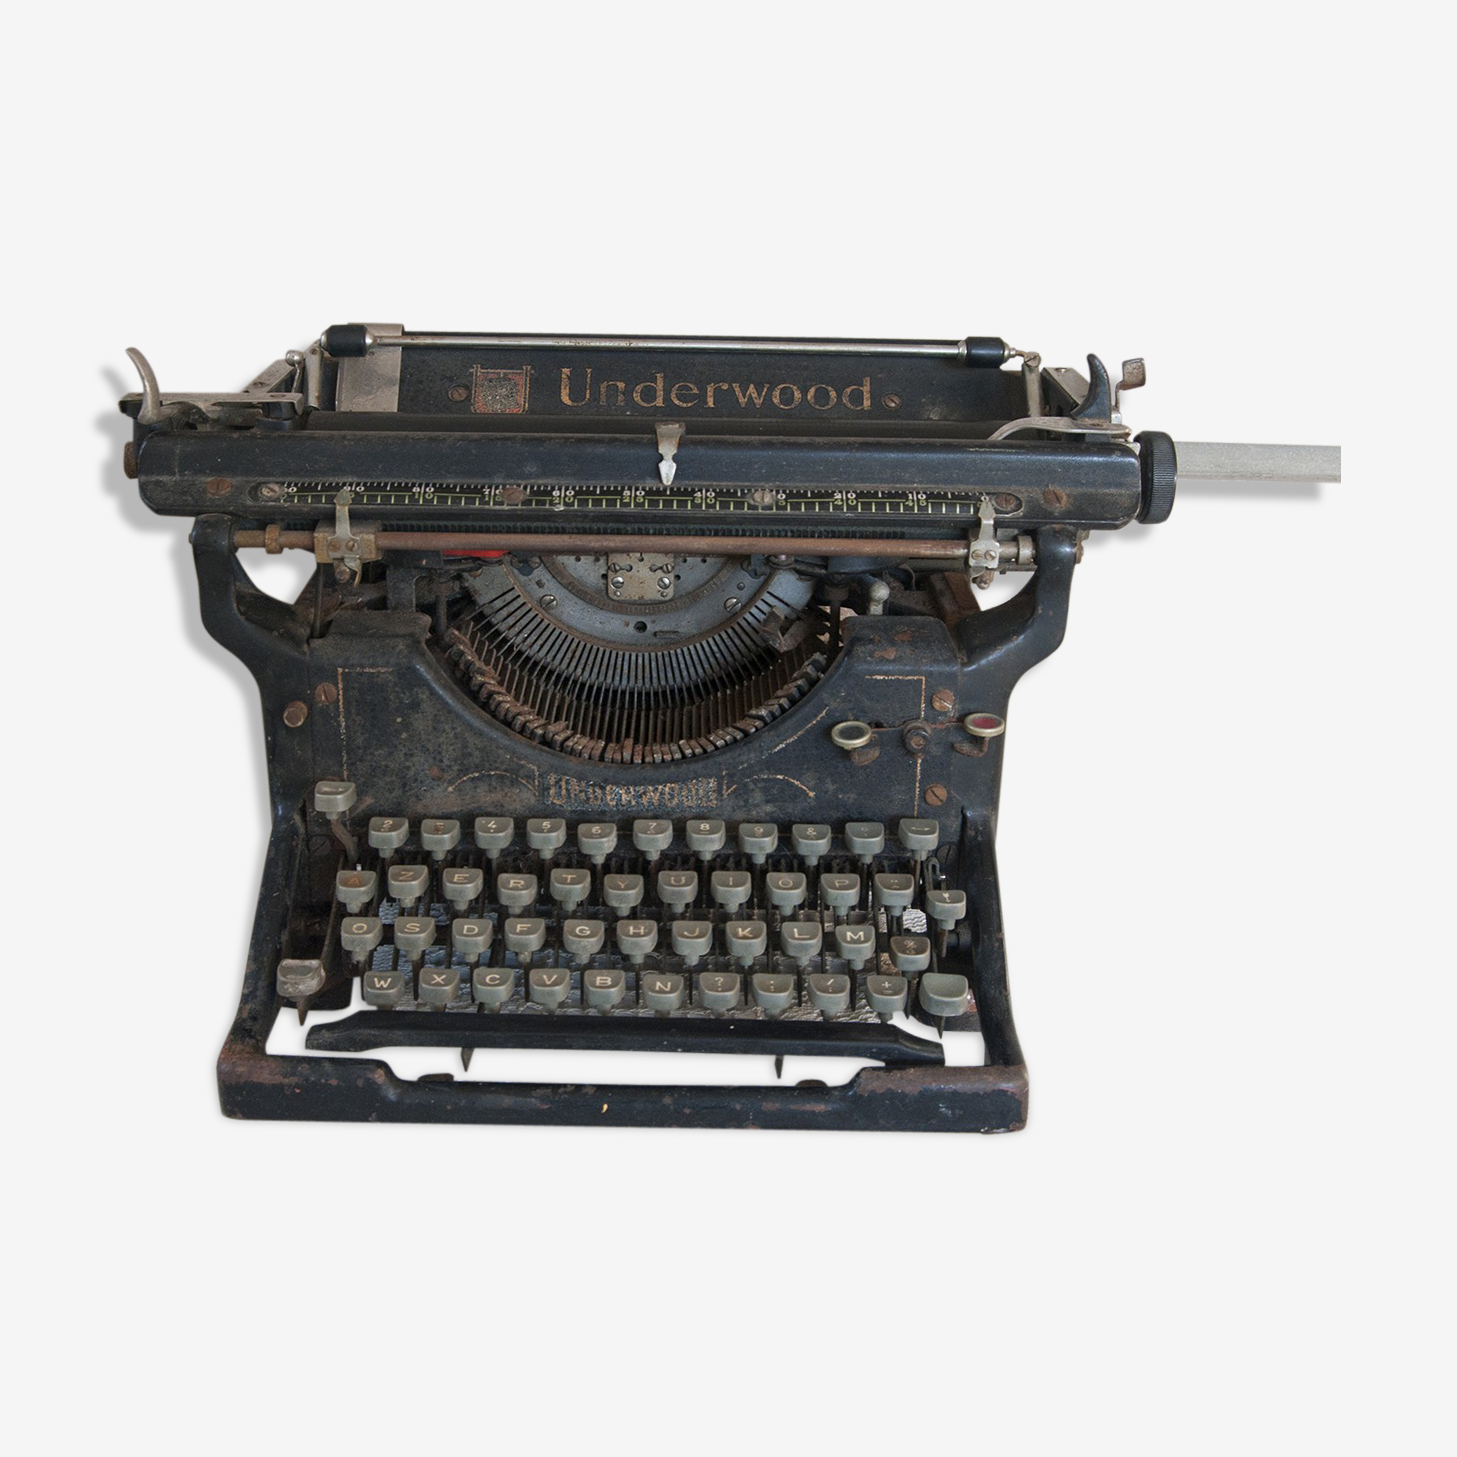 Vintage 1910 Underwood typewriter